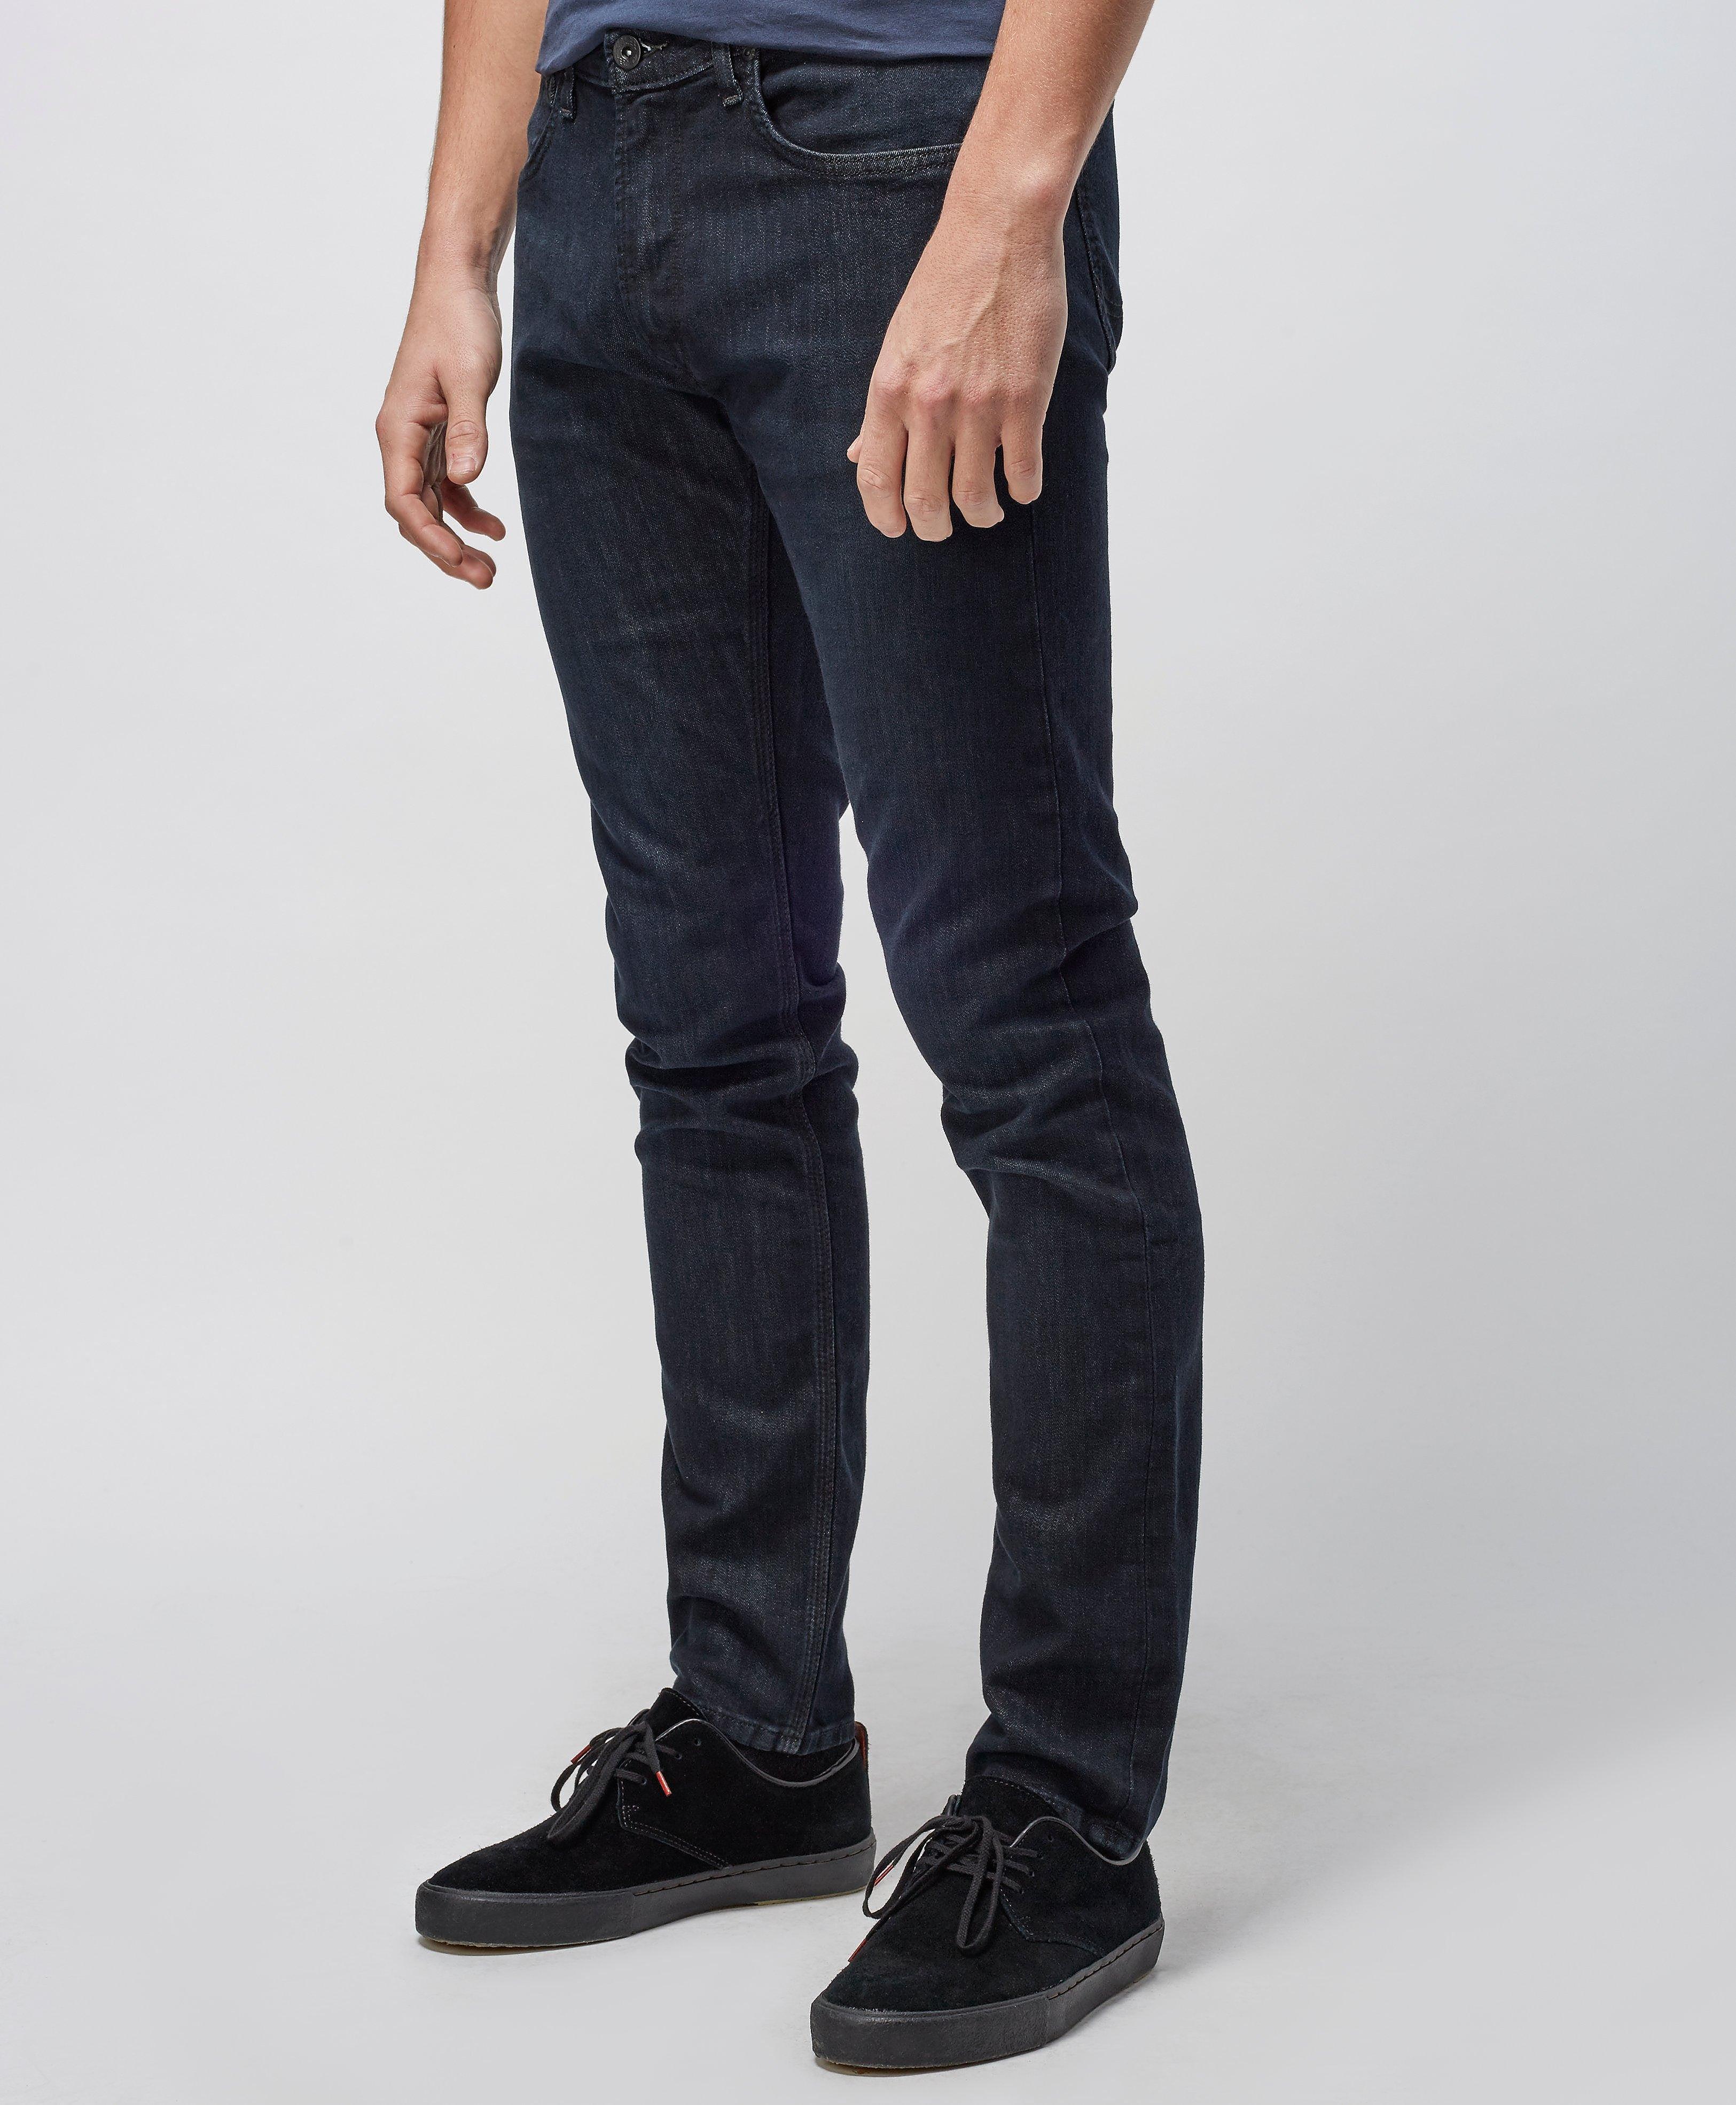 Lee Luke Slim Tapered Fit Jeans